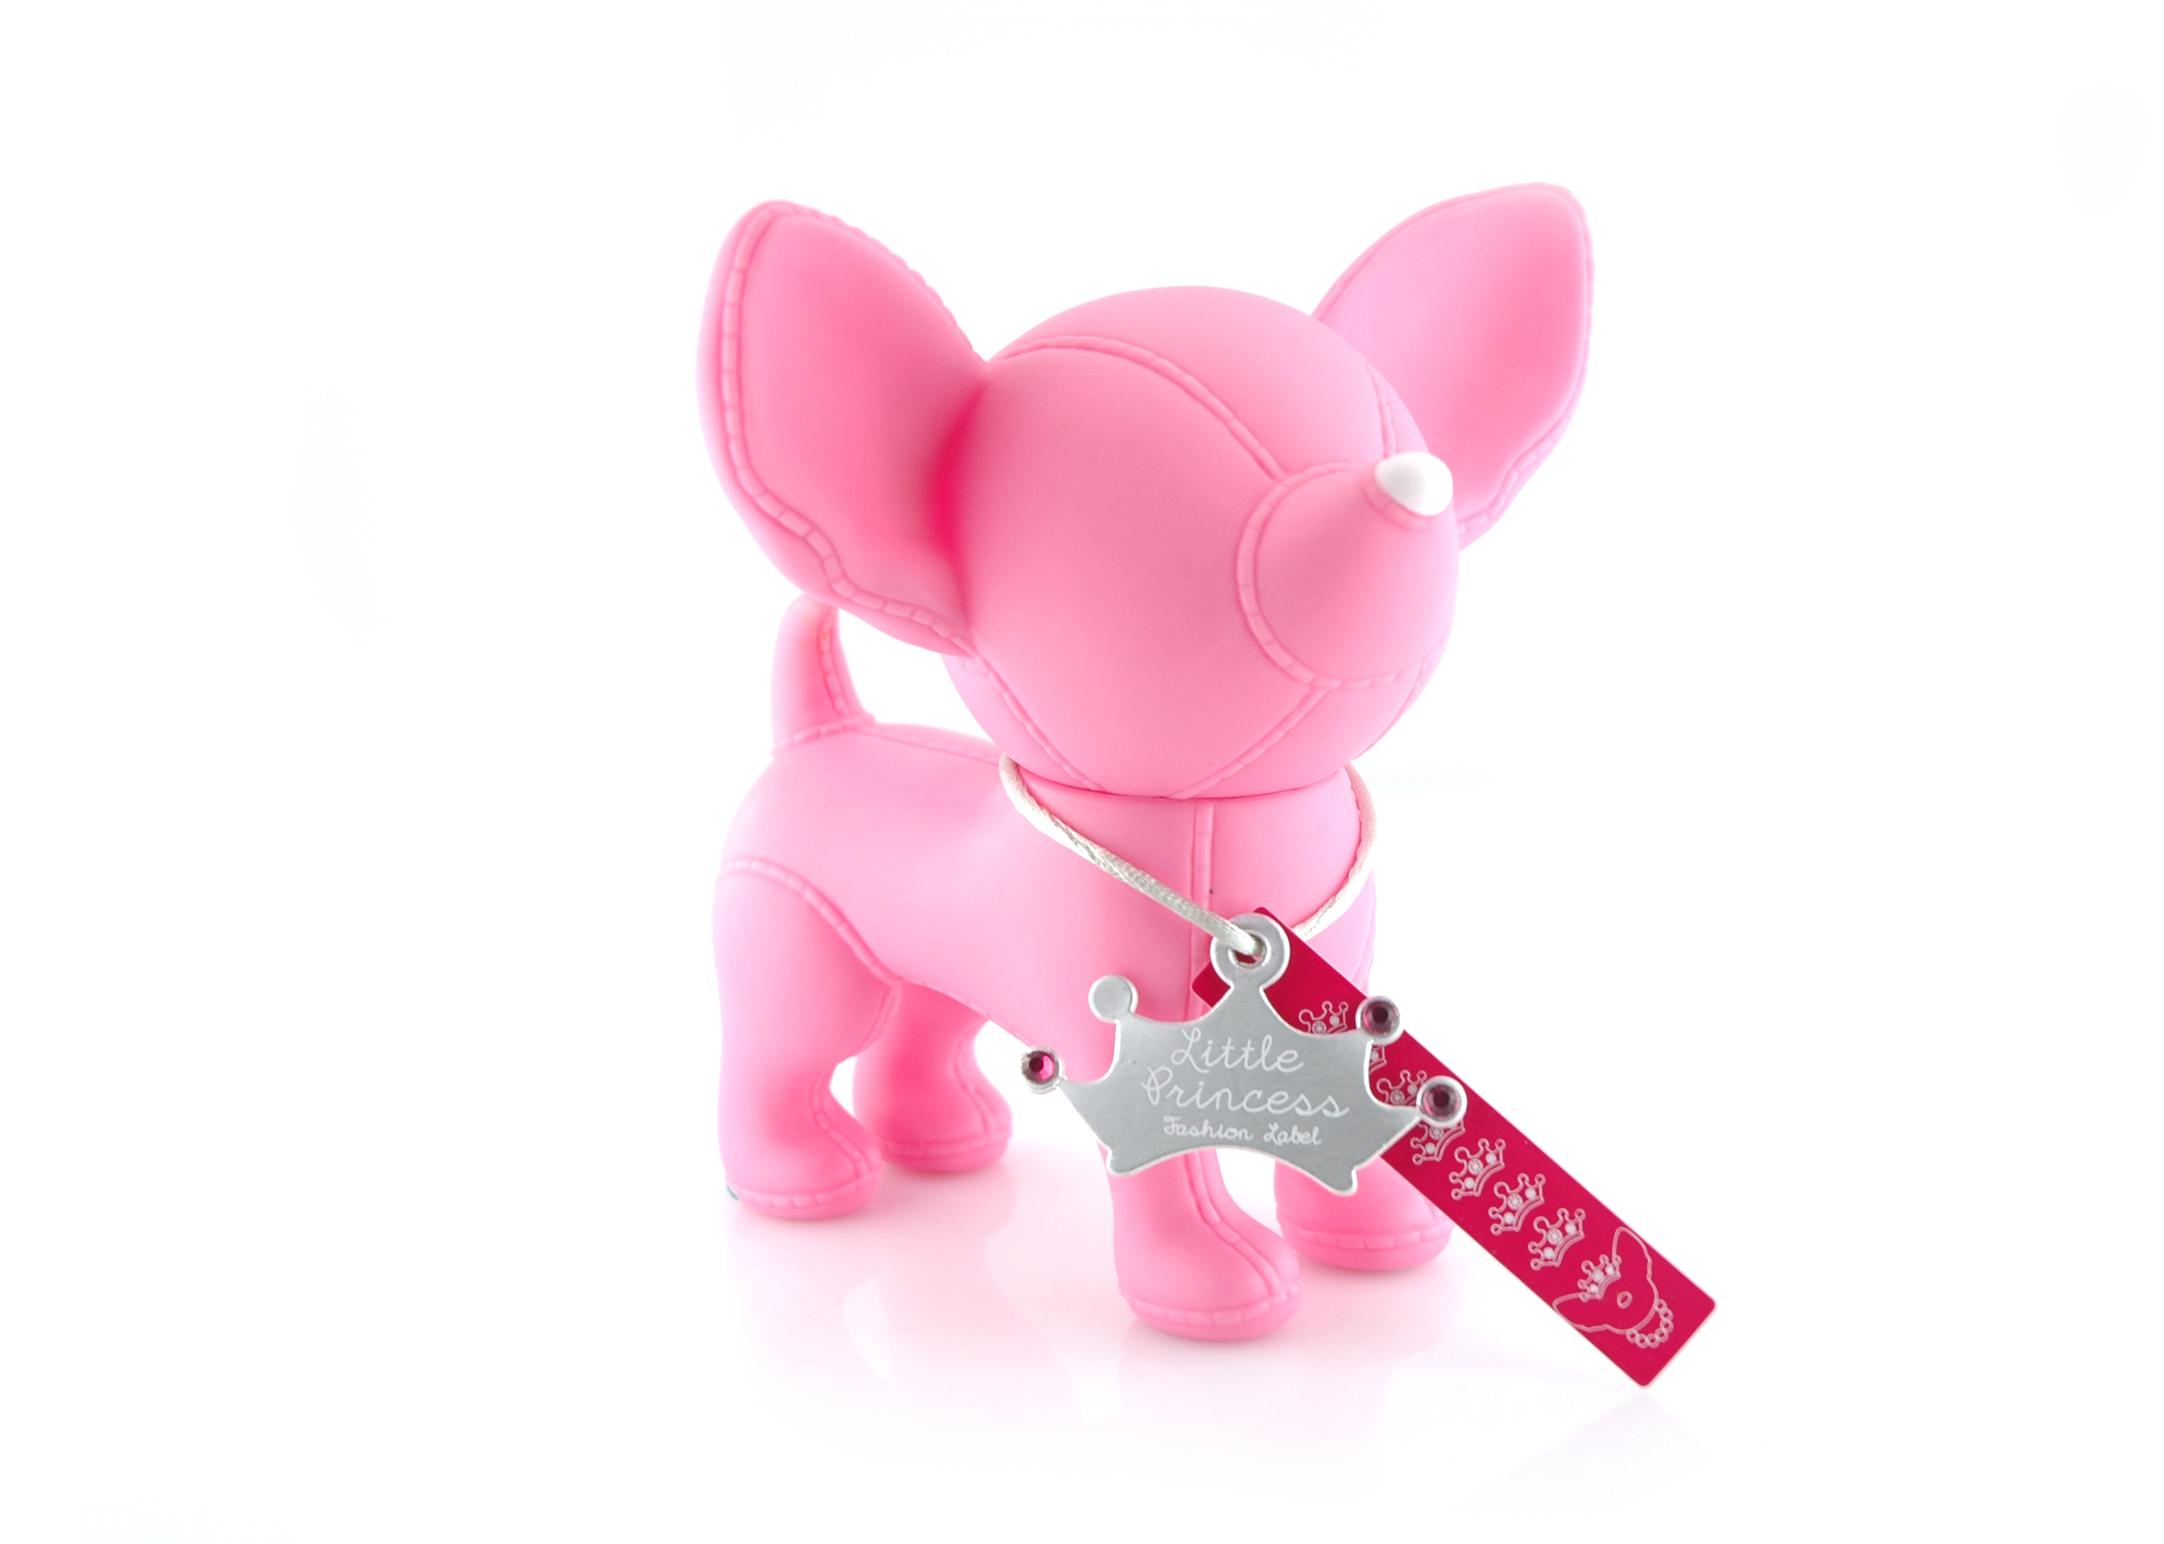 Whaa Whaa Doggybank Chihuahua Princess Money-Box